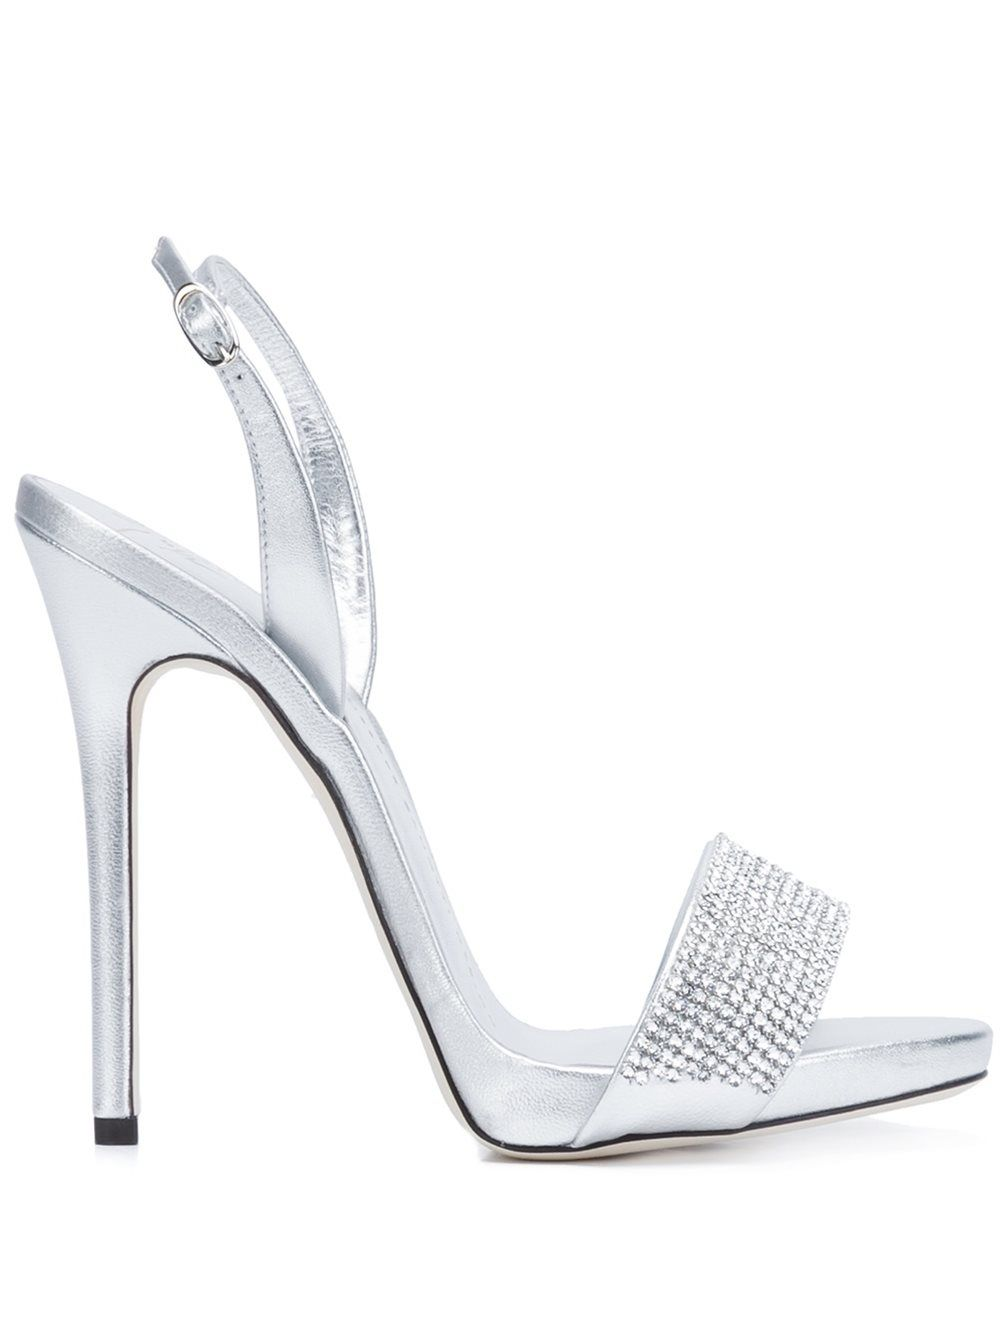 Giuseppe Zanotti Design Sophie Crystal Sandals Crystal Sandals Cheap Womens Sandals Sandals Heels